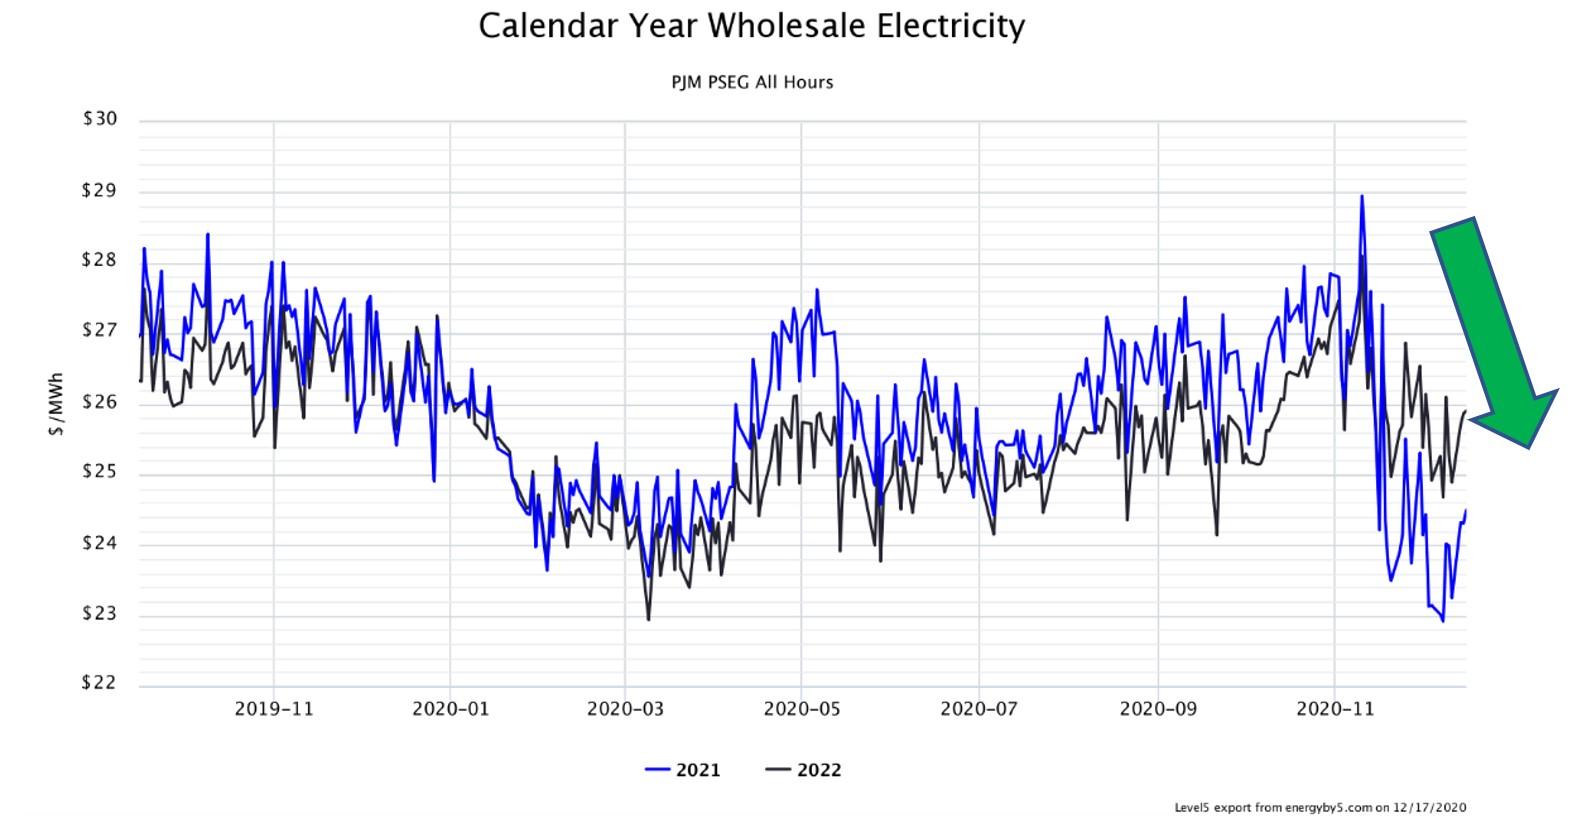 Calendar Year Wholesale Electricity PJM PSEG